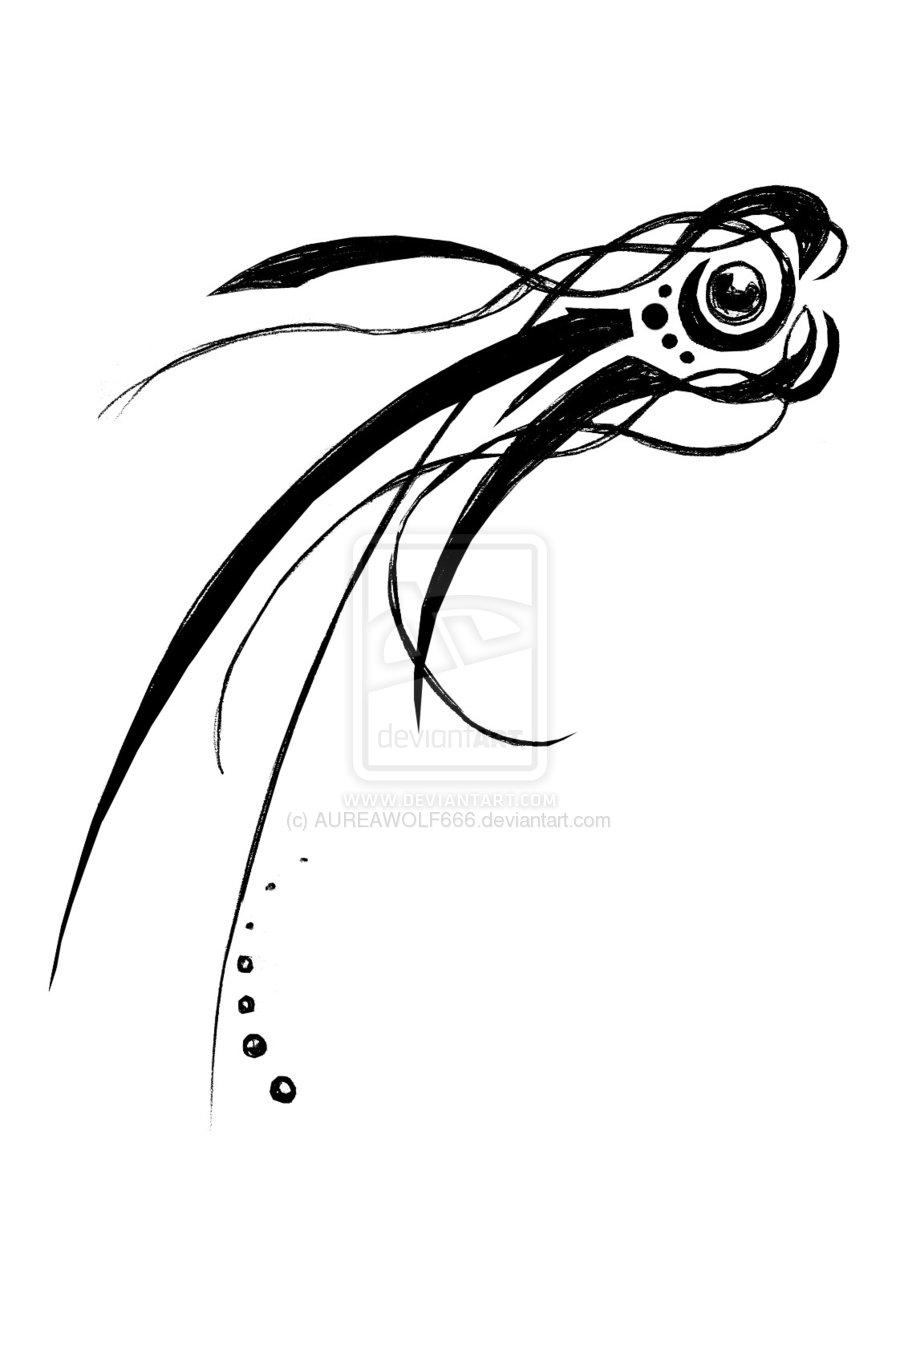 900x1345 Cadong Tattoo Gallery Little Bird Tattoo Old School Mic Shure